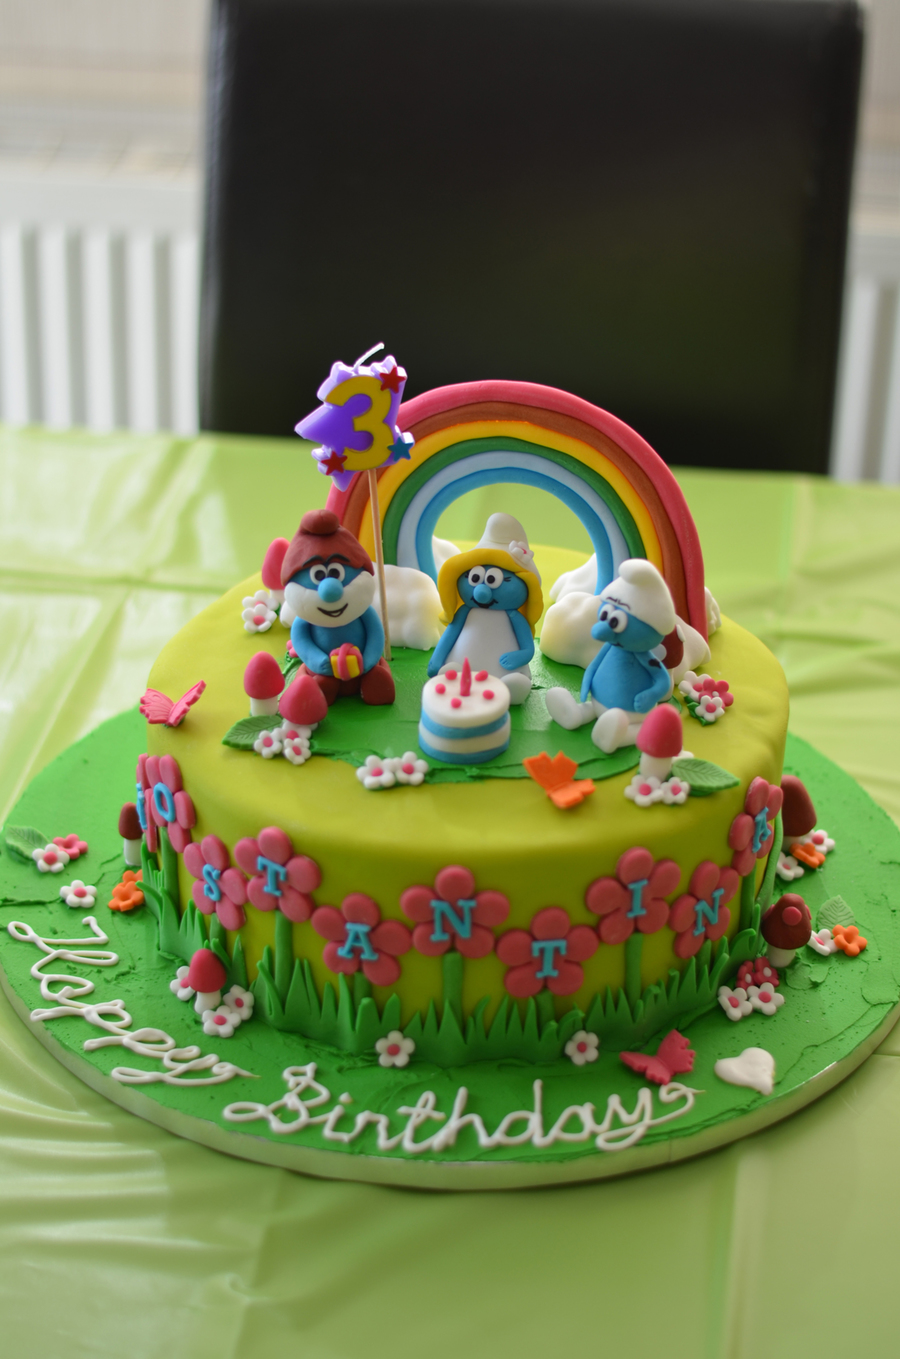 Marvelous Smurf Birthday Cake Cakecentral Com Funny Birthday Cards Online Overcheapnameinfo